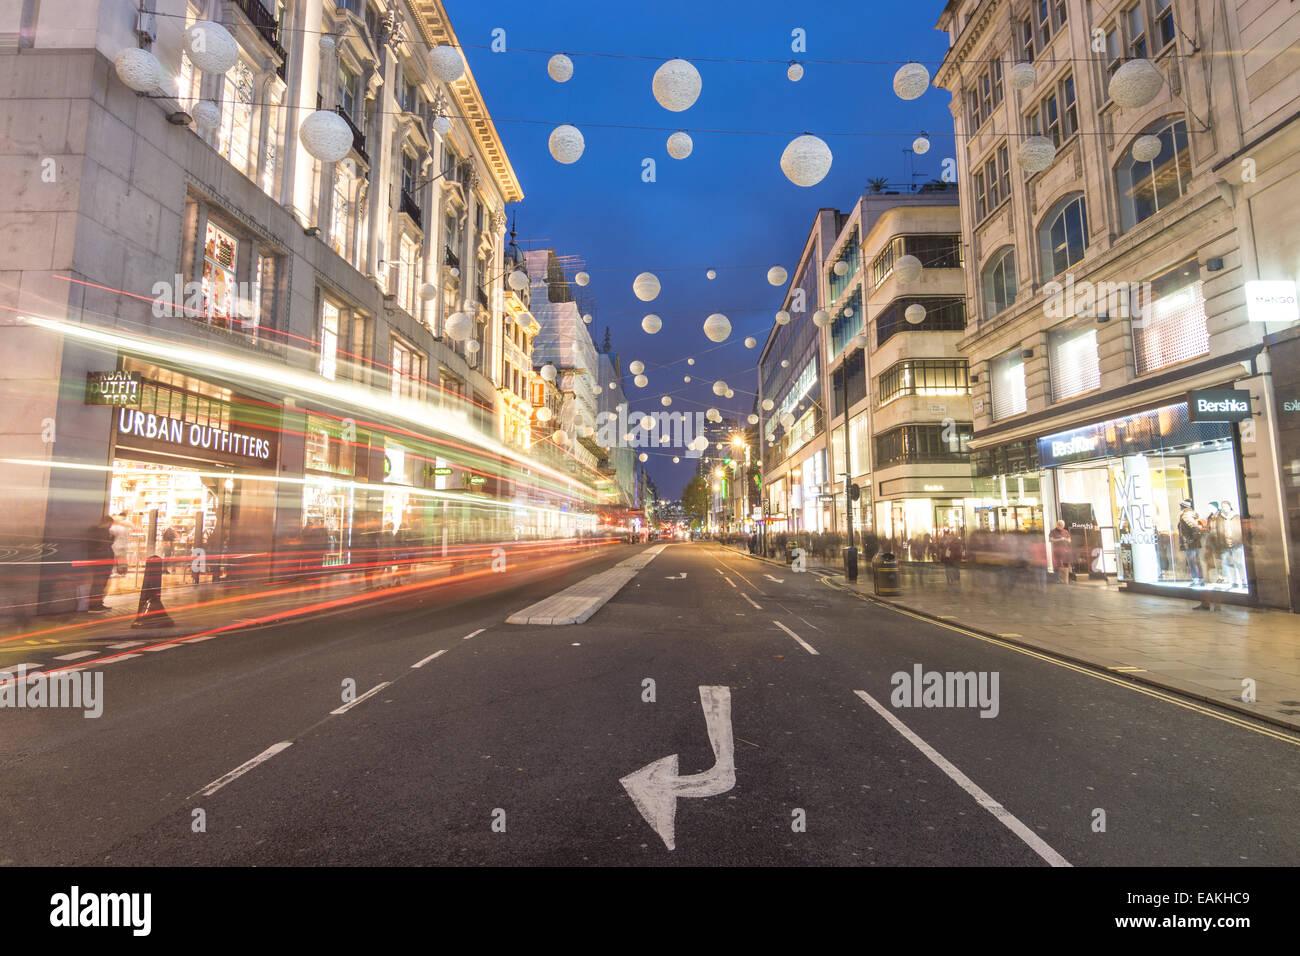 oxford street at night, London - Stock Image